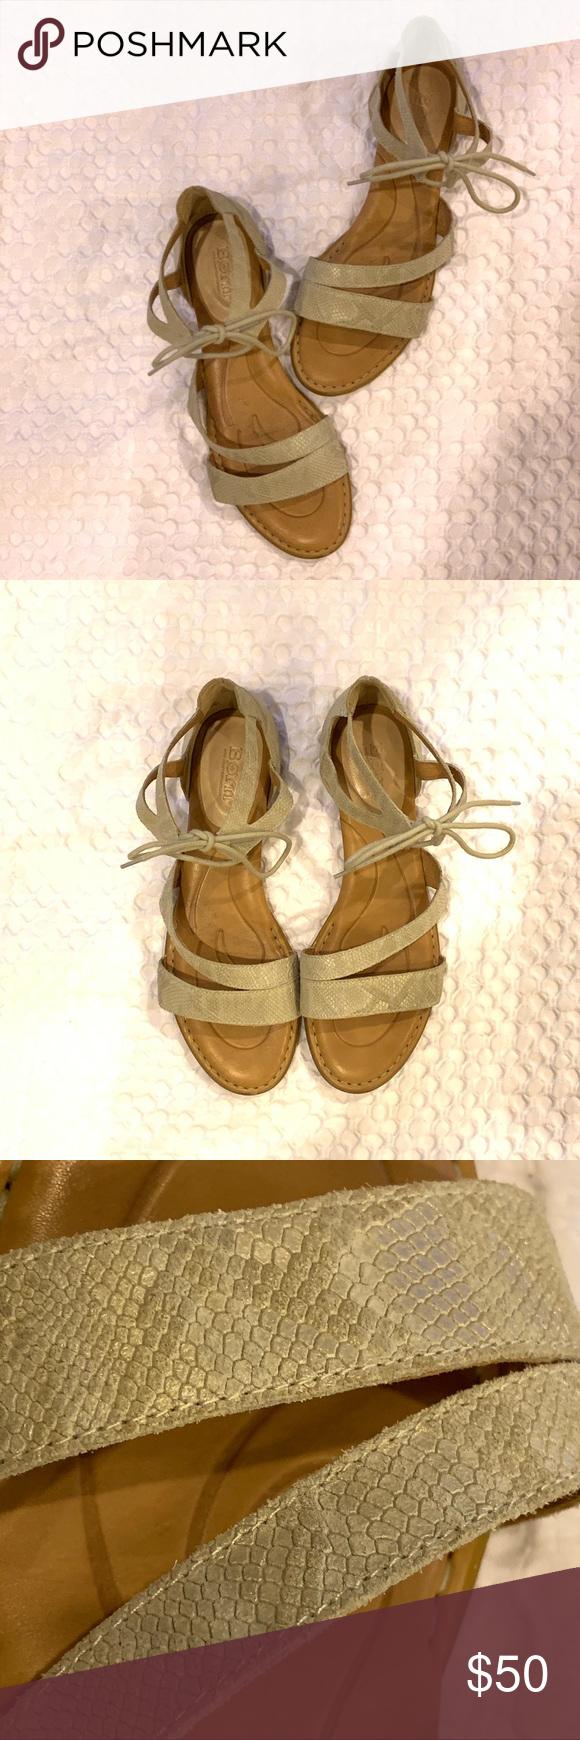 280be37f1f3a Born Casma Cream Sandals Size 9 Clean lines and a unique silhouette give  the Born Casma